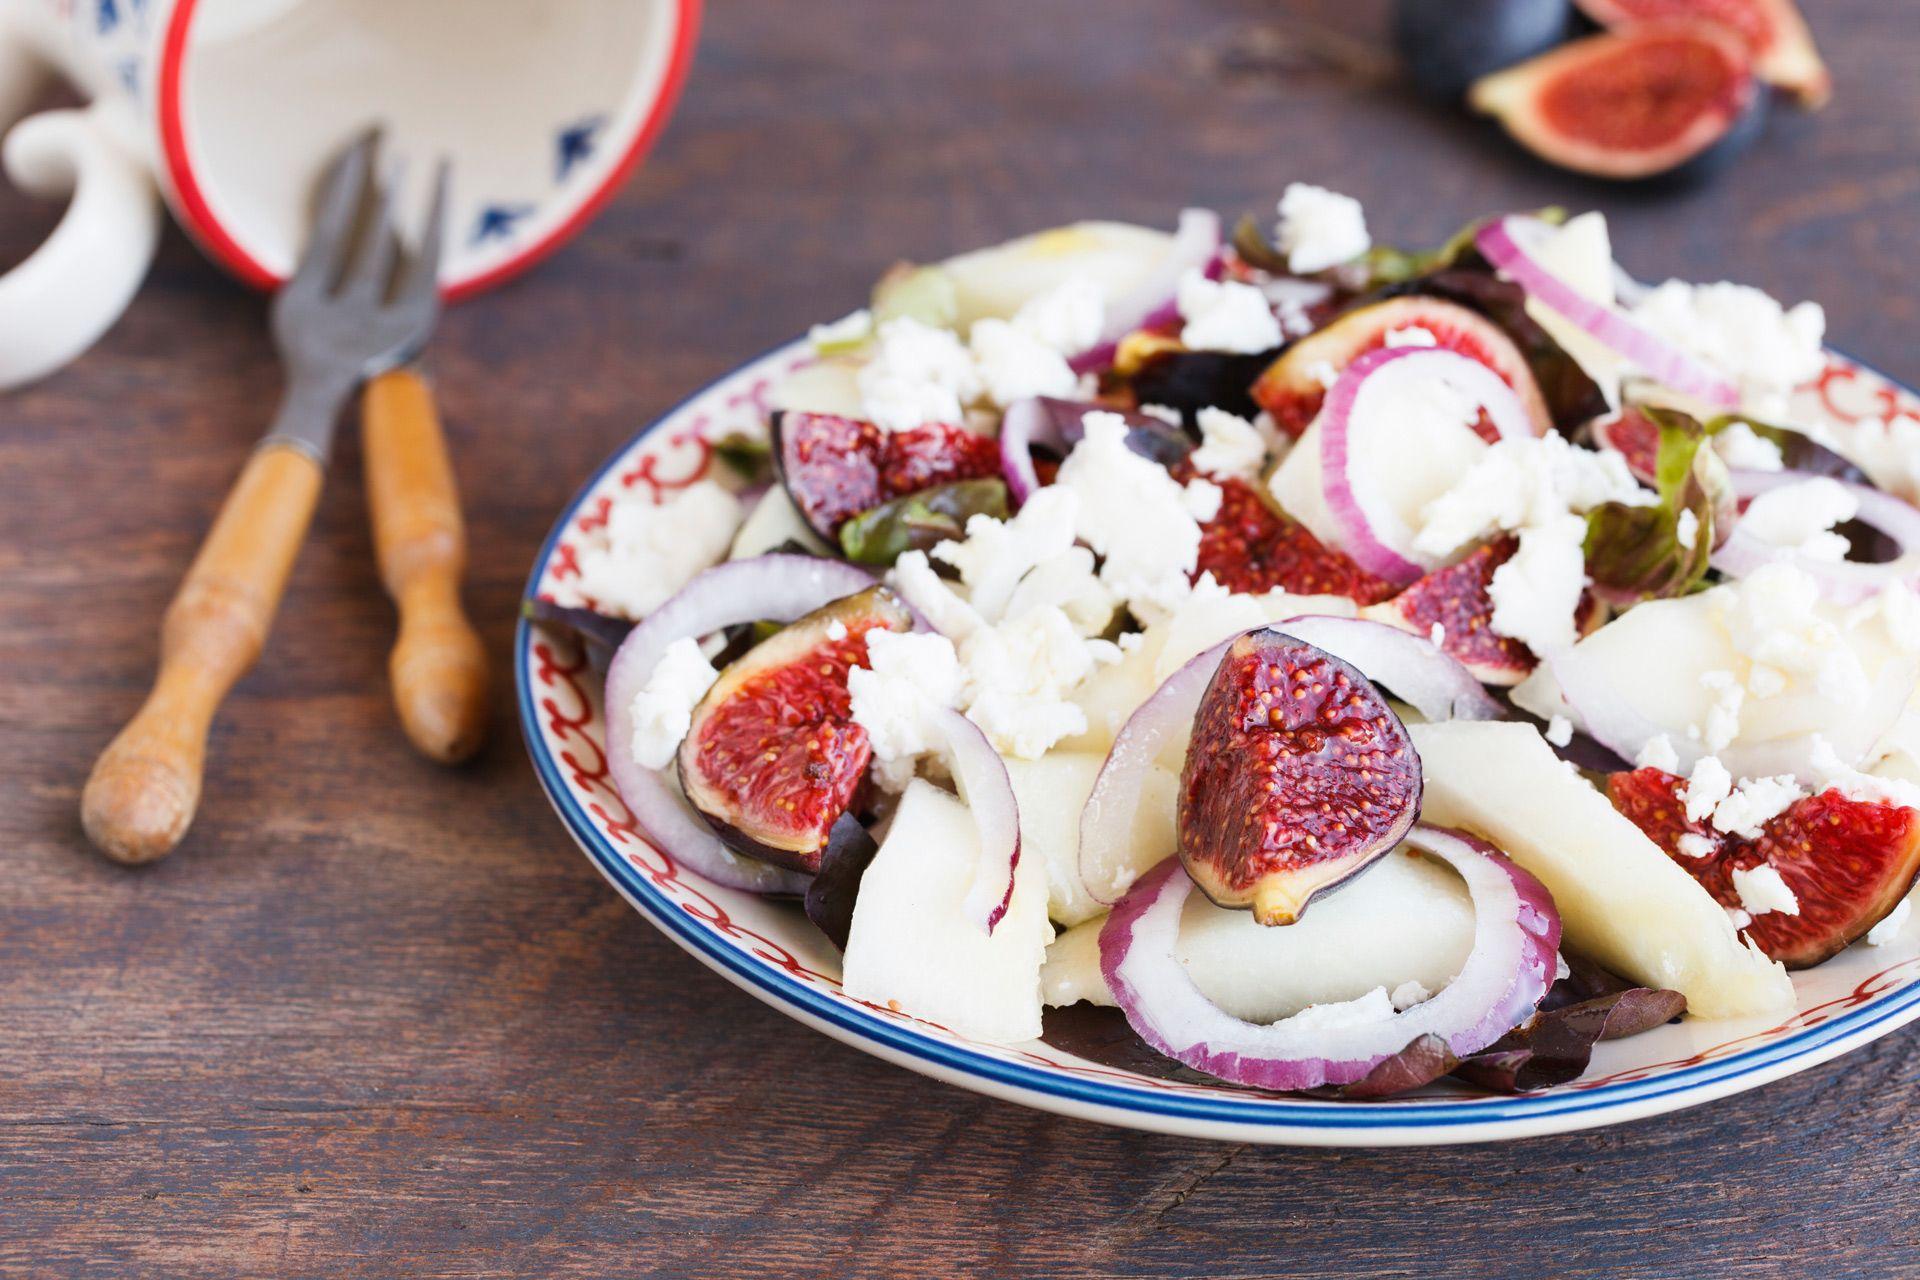 Herbst-Salat #figs #melon #onion #loveit #cheese #parmesan #healthy #veggy #easy #selfmade #love #lidlösterreich #enjoy #tasty #idea #autumn #salad